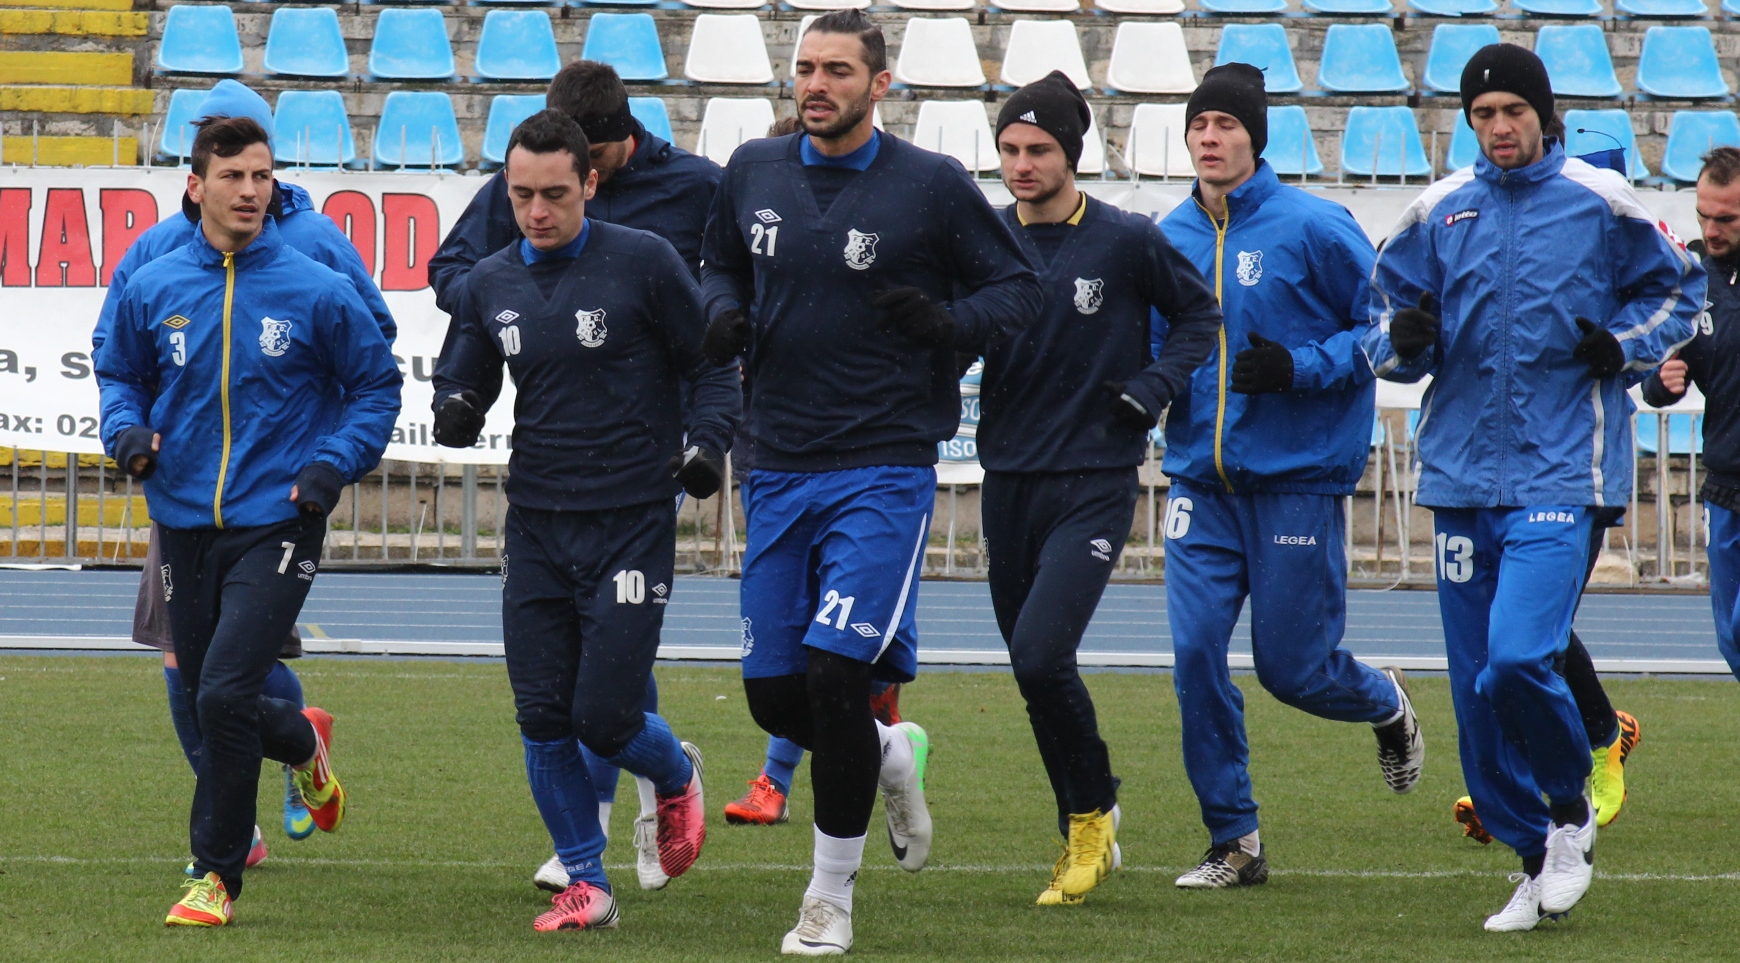 FC Farul pleaca astazi de la Constanta la Braila